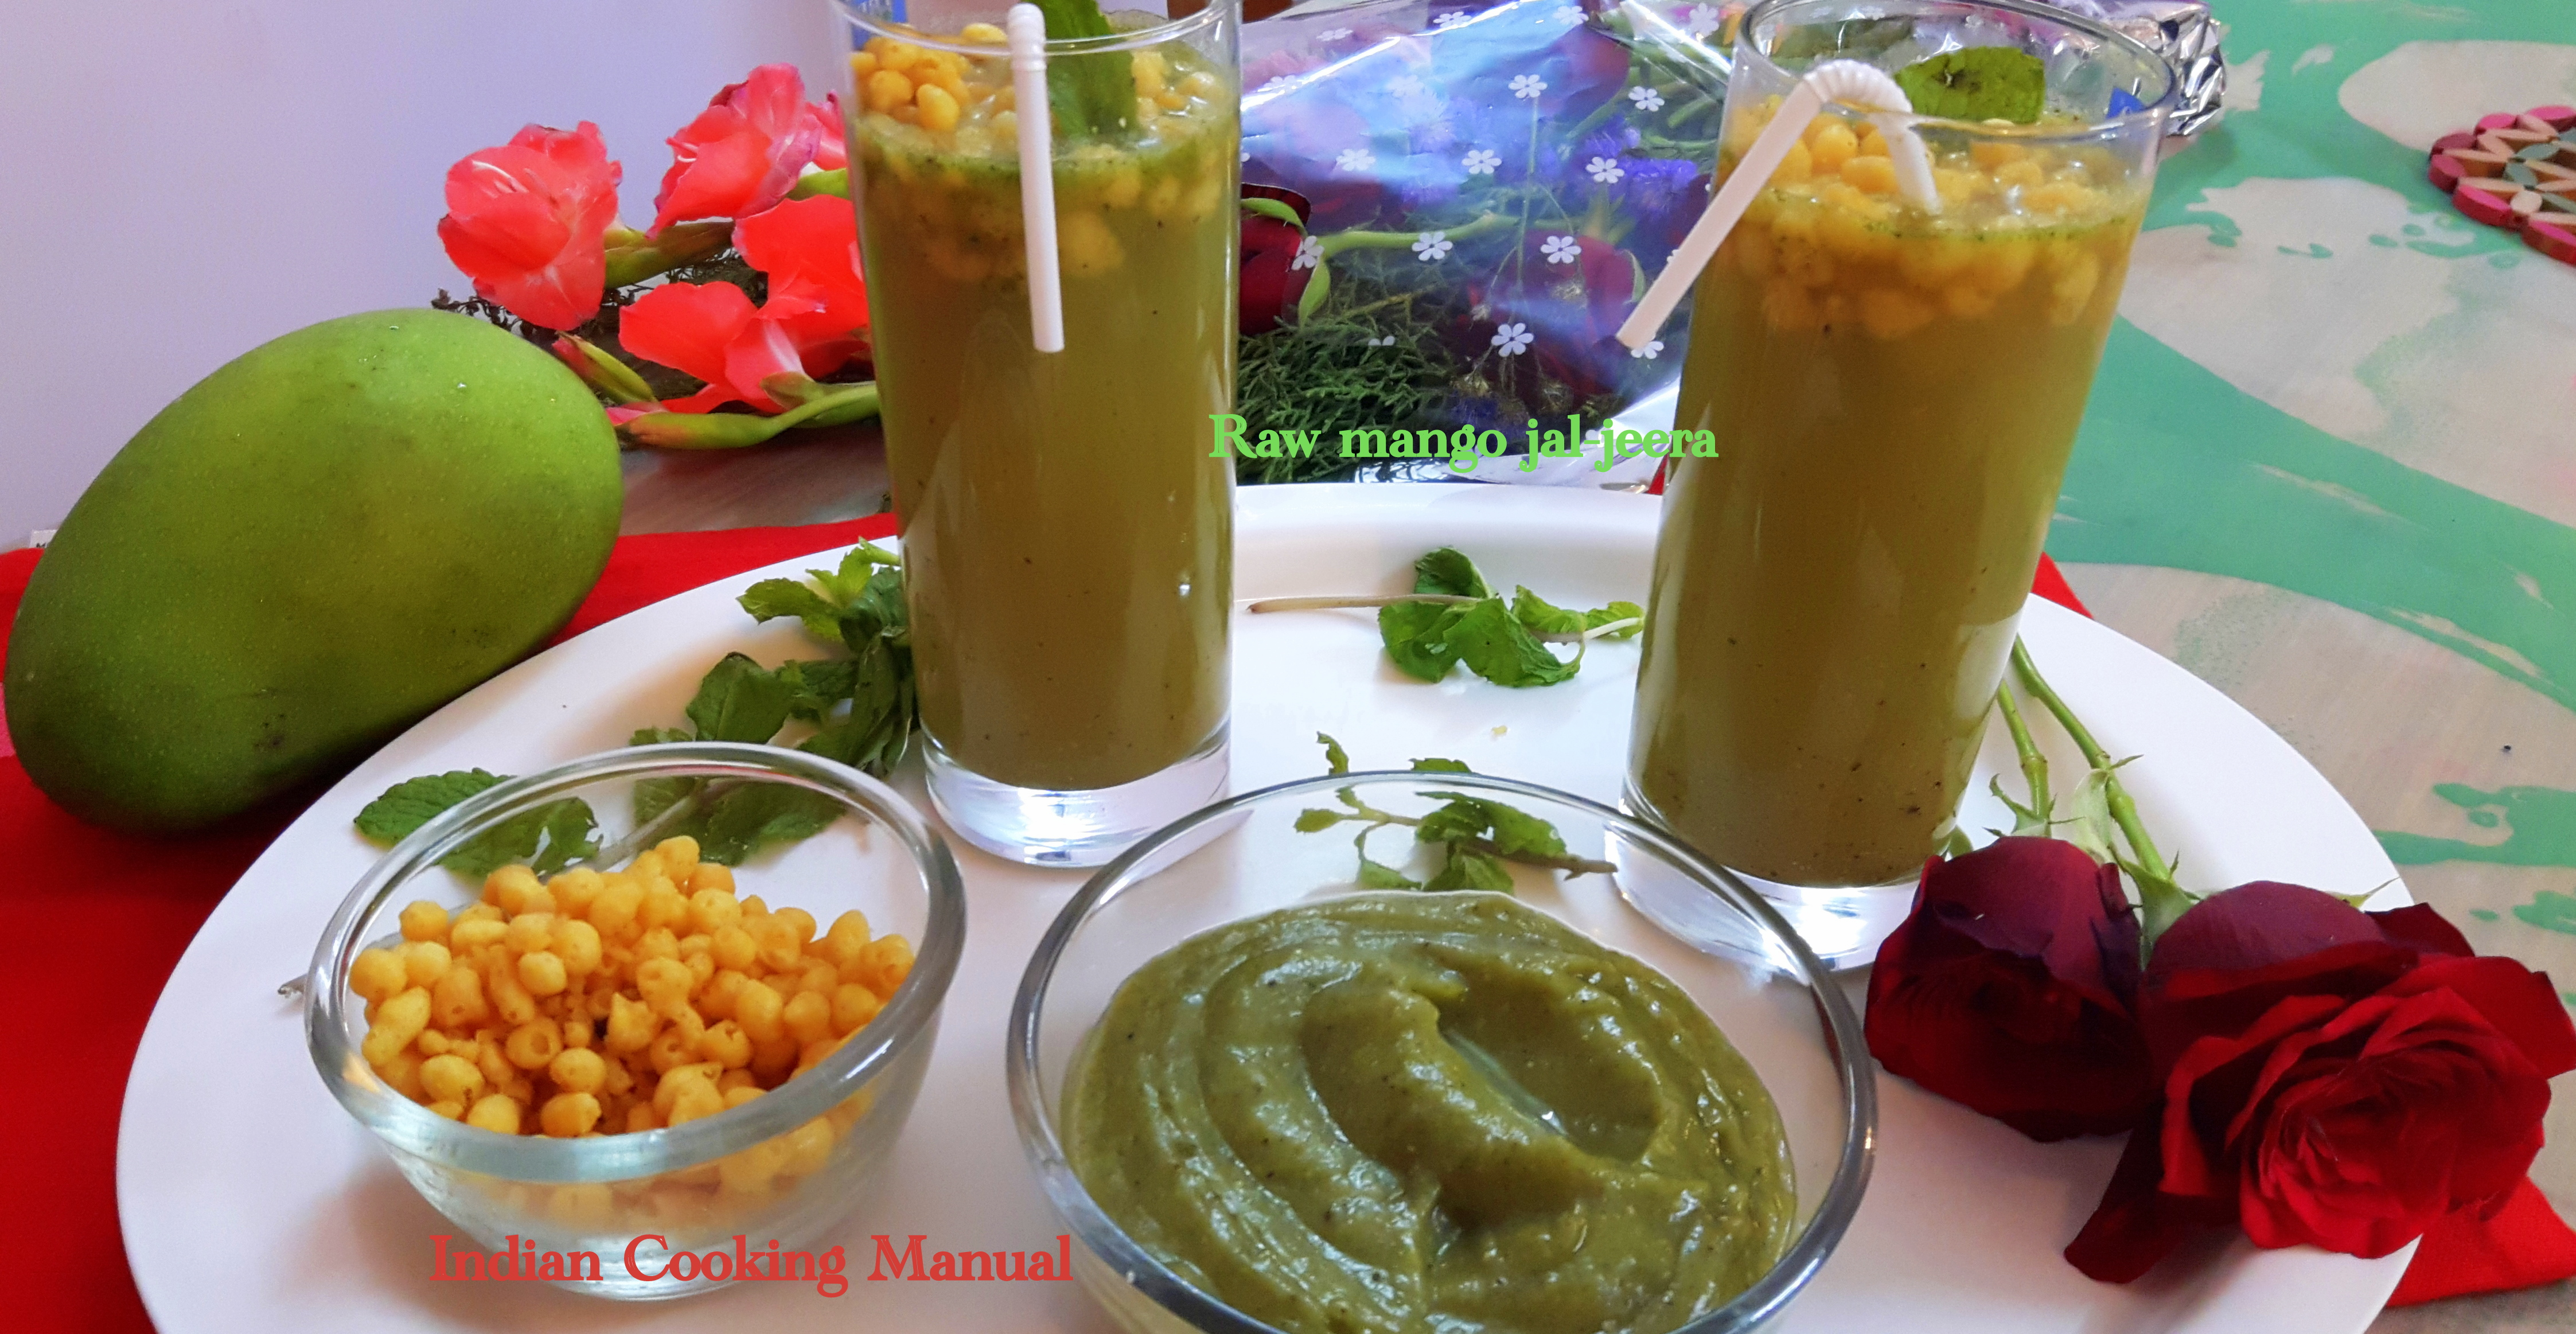 Raw mango jal-jeera (kairi ka jal-jeera)